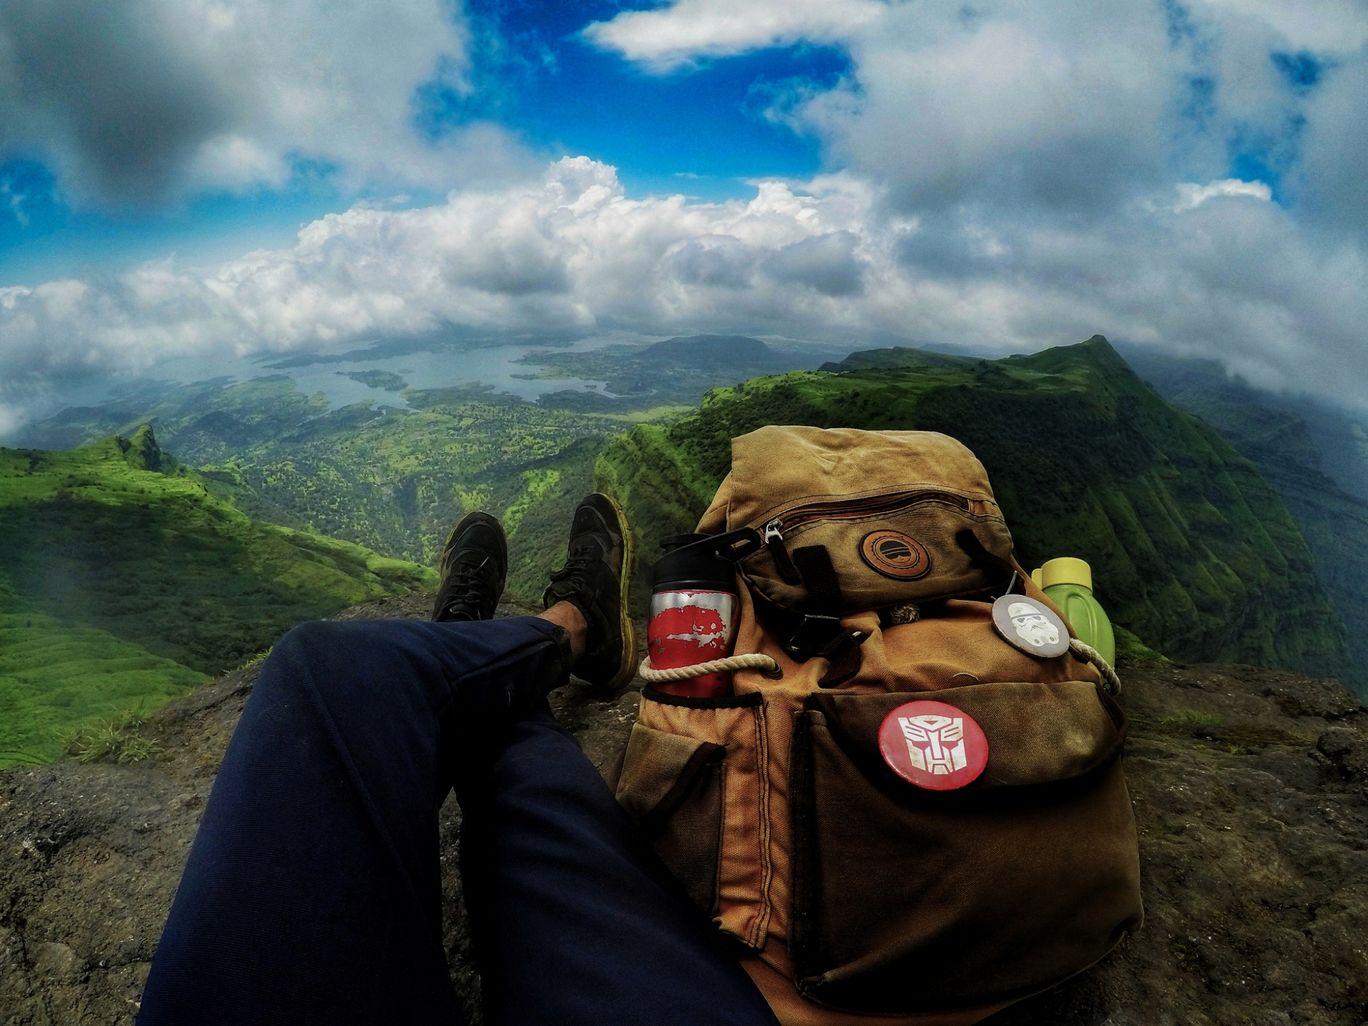 Photo of kalsubai Treking And Camping By Manish Dandekar